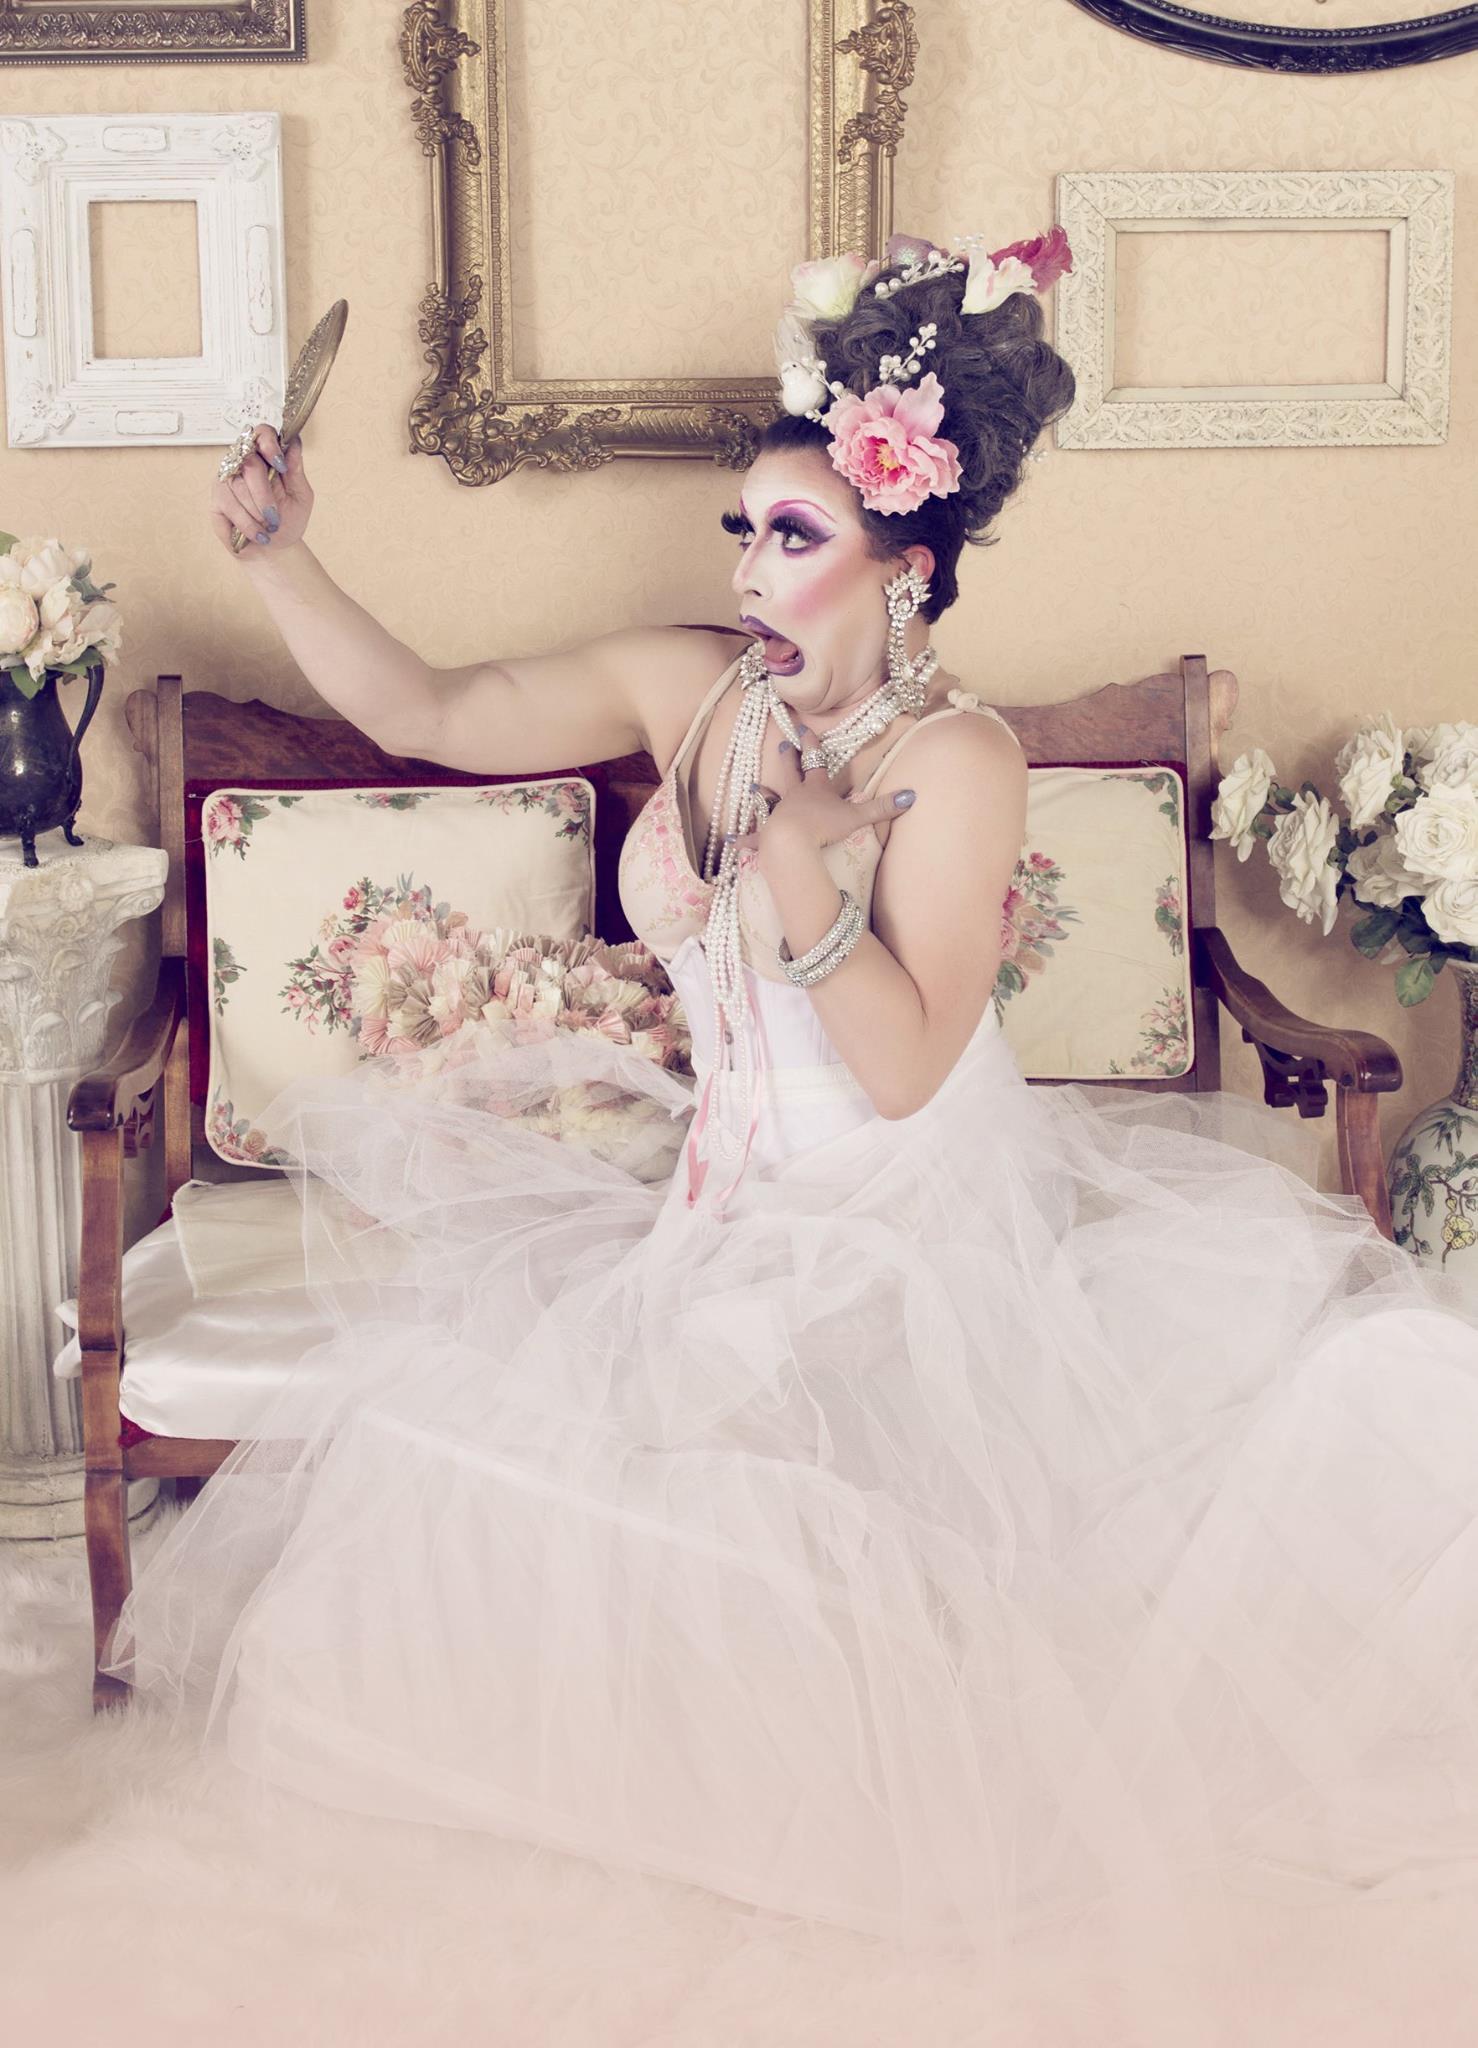 Mary Nolan - Photo by Laura Dark